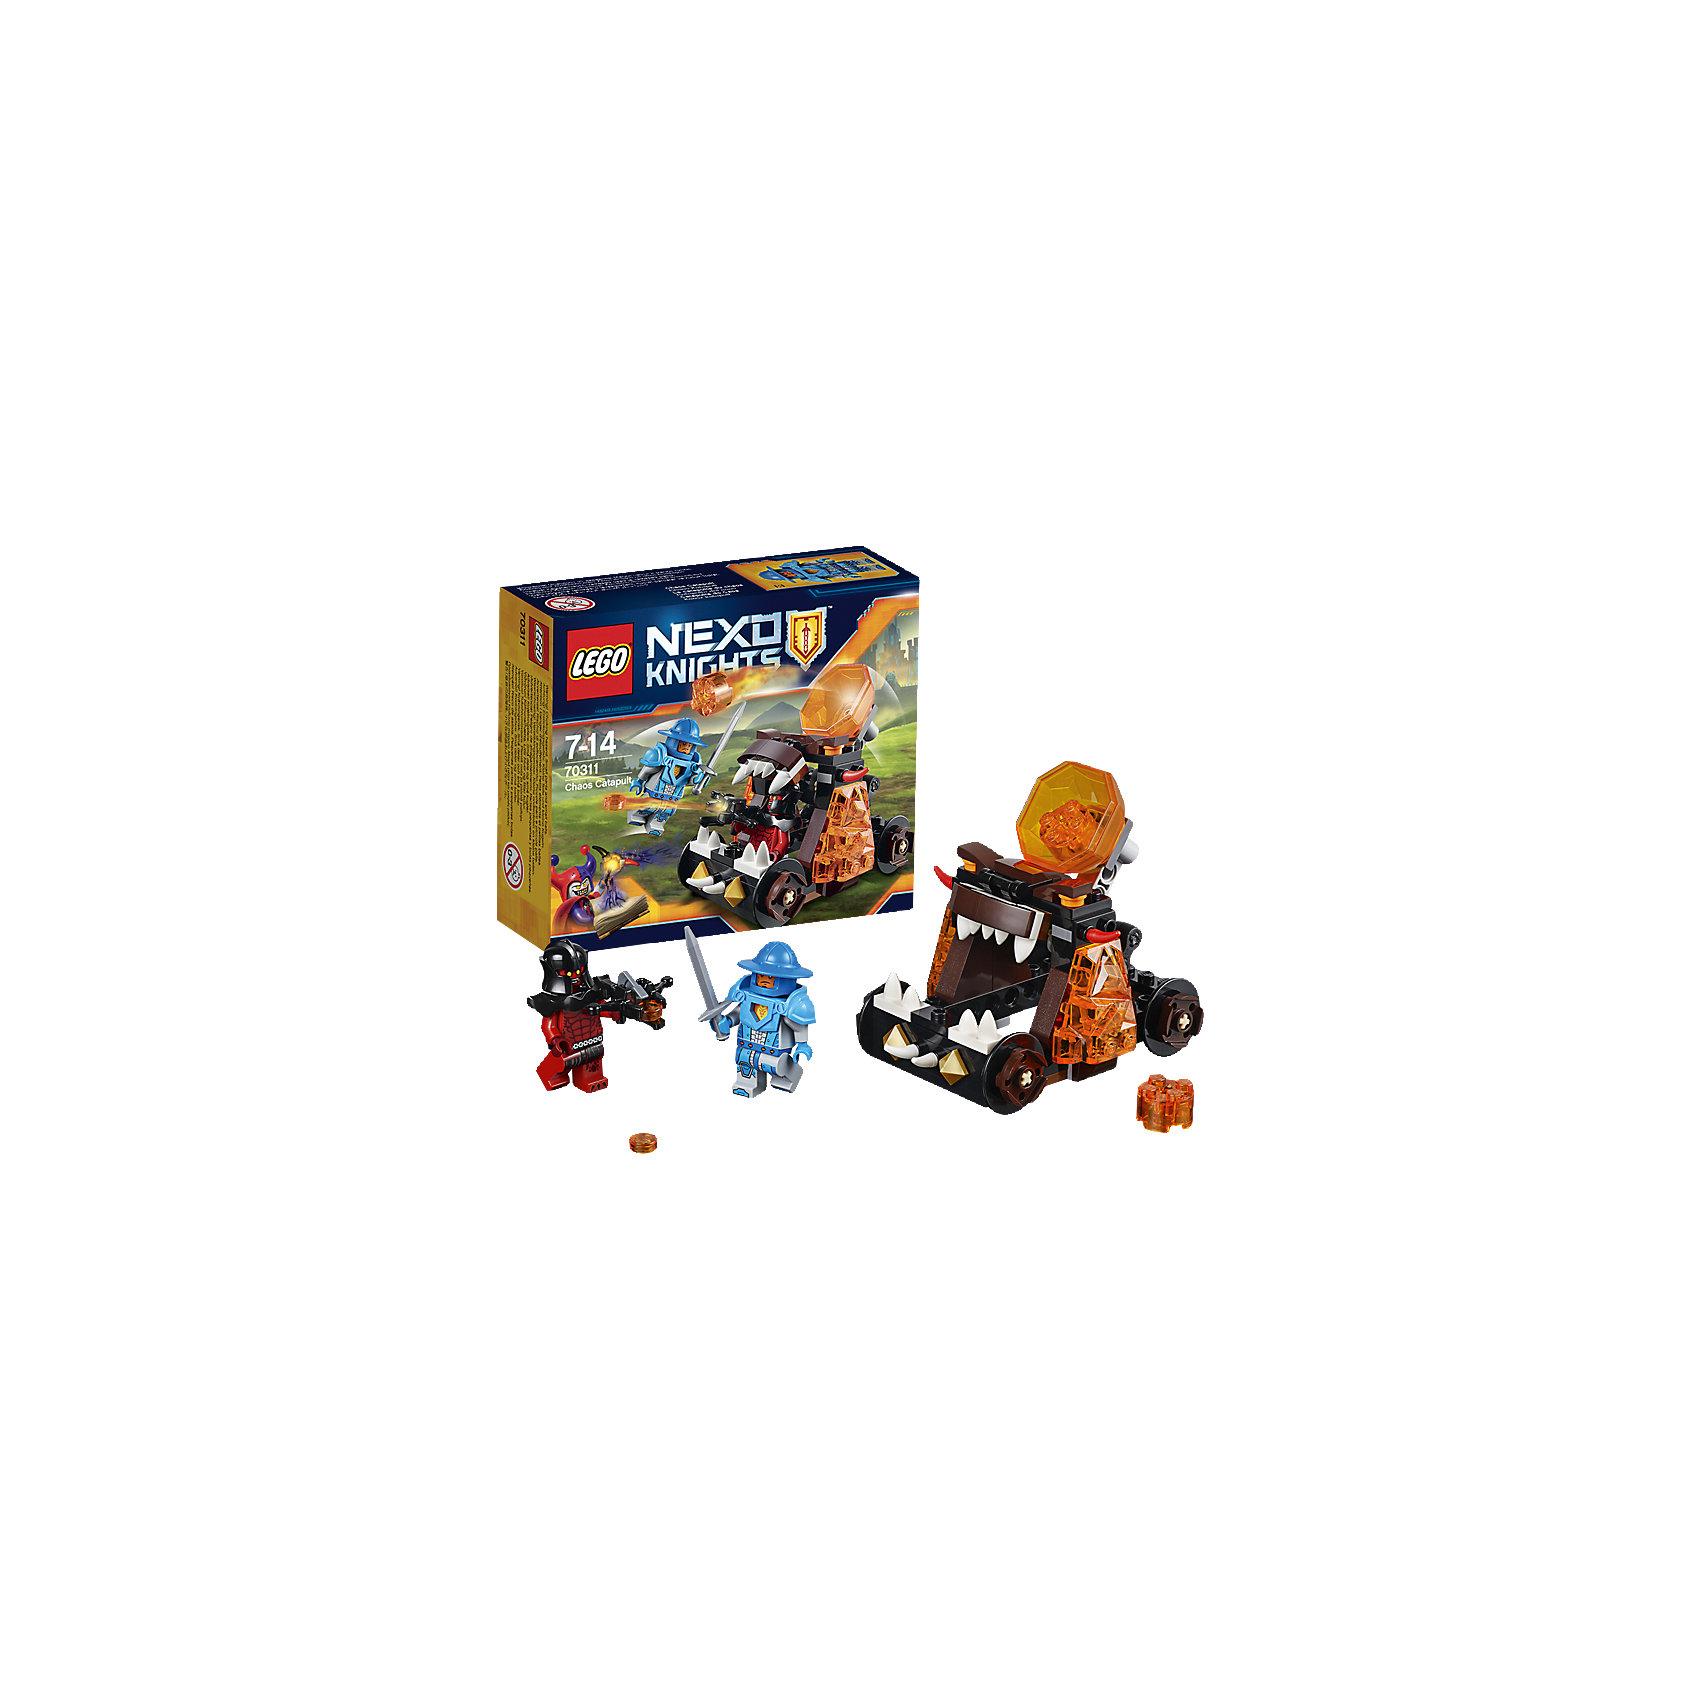 LEGO LEGO NEXO KNIGHTS 70311: Безумная катапульта lego nexo knights 70357 лего нексо королевский замок найтон